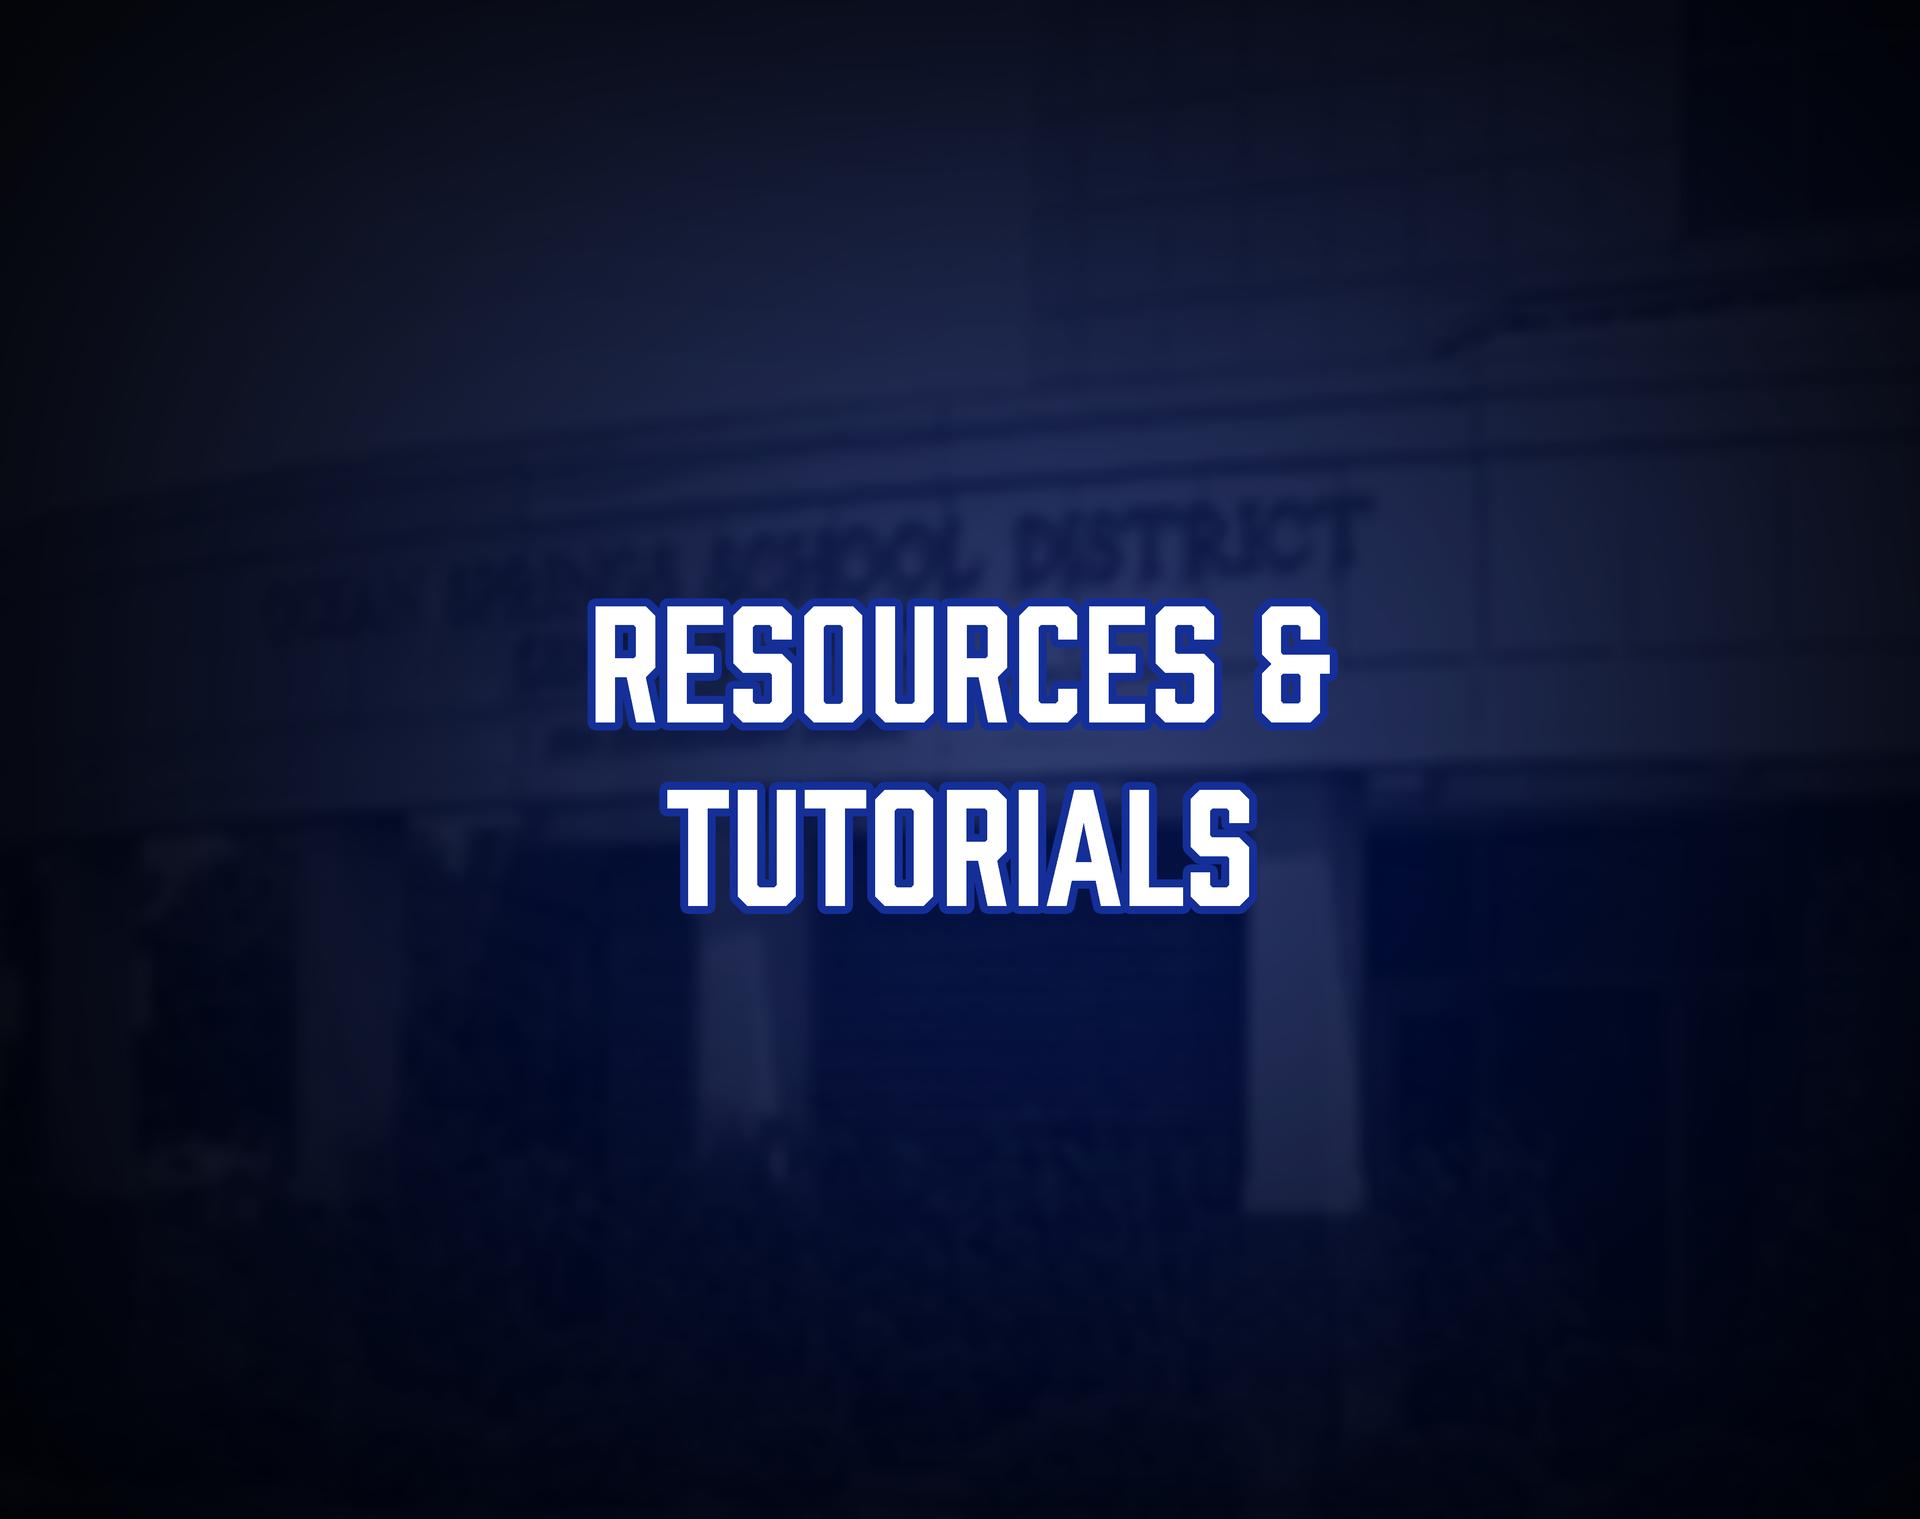 Resources & Tutorials Tile